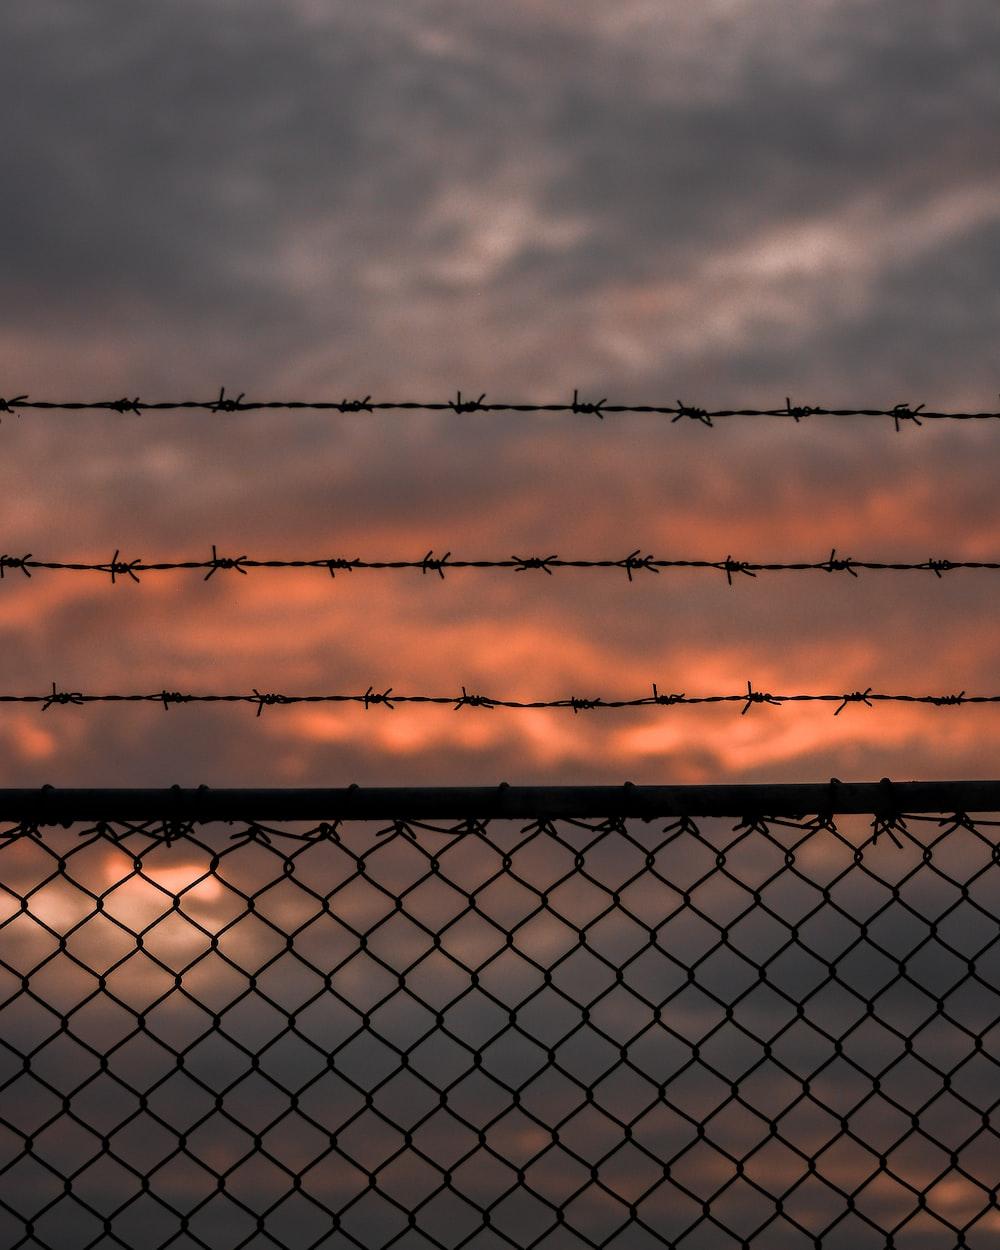 grey metal fence under grey clouds